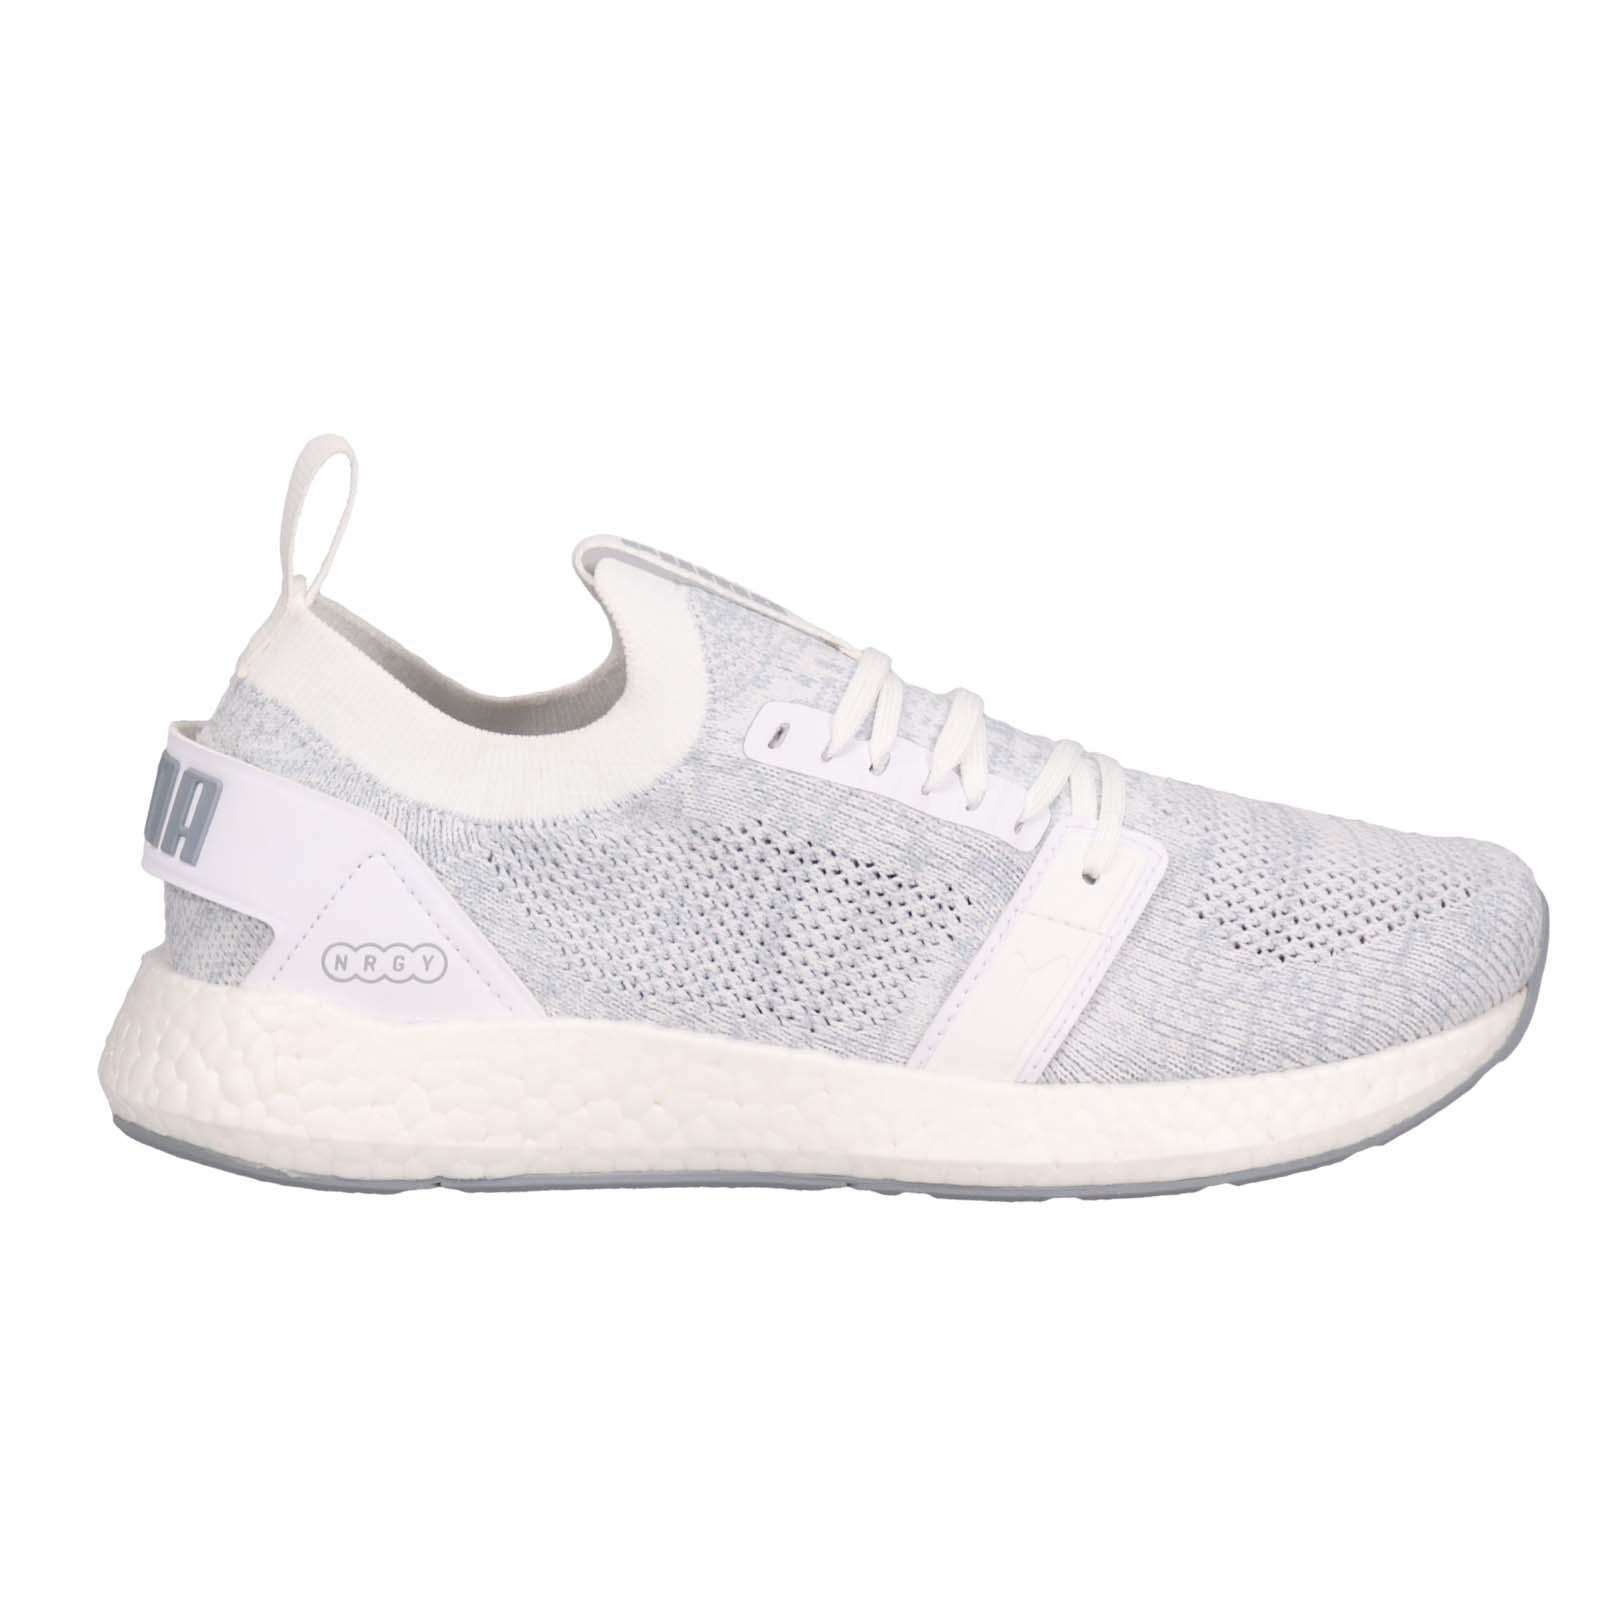 5808b3bf4d52aa Puma NRGY Neko Engineer Knit Wns White Quarry Women Running Shoes ...